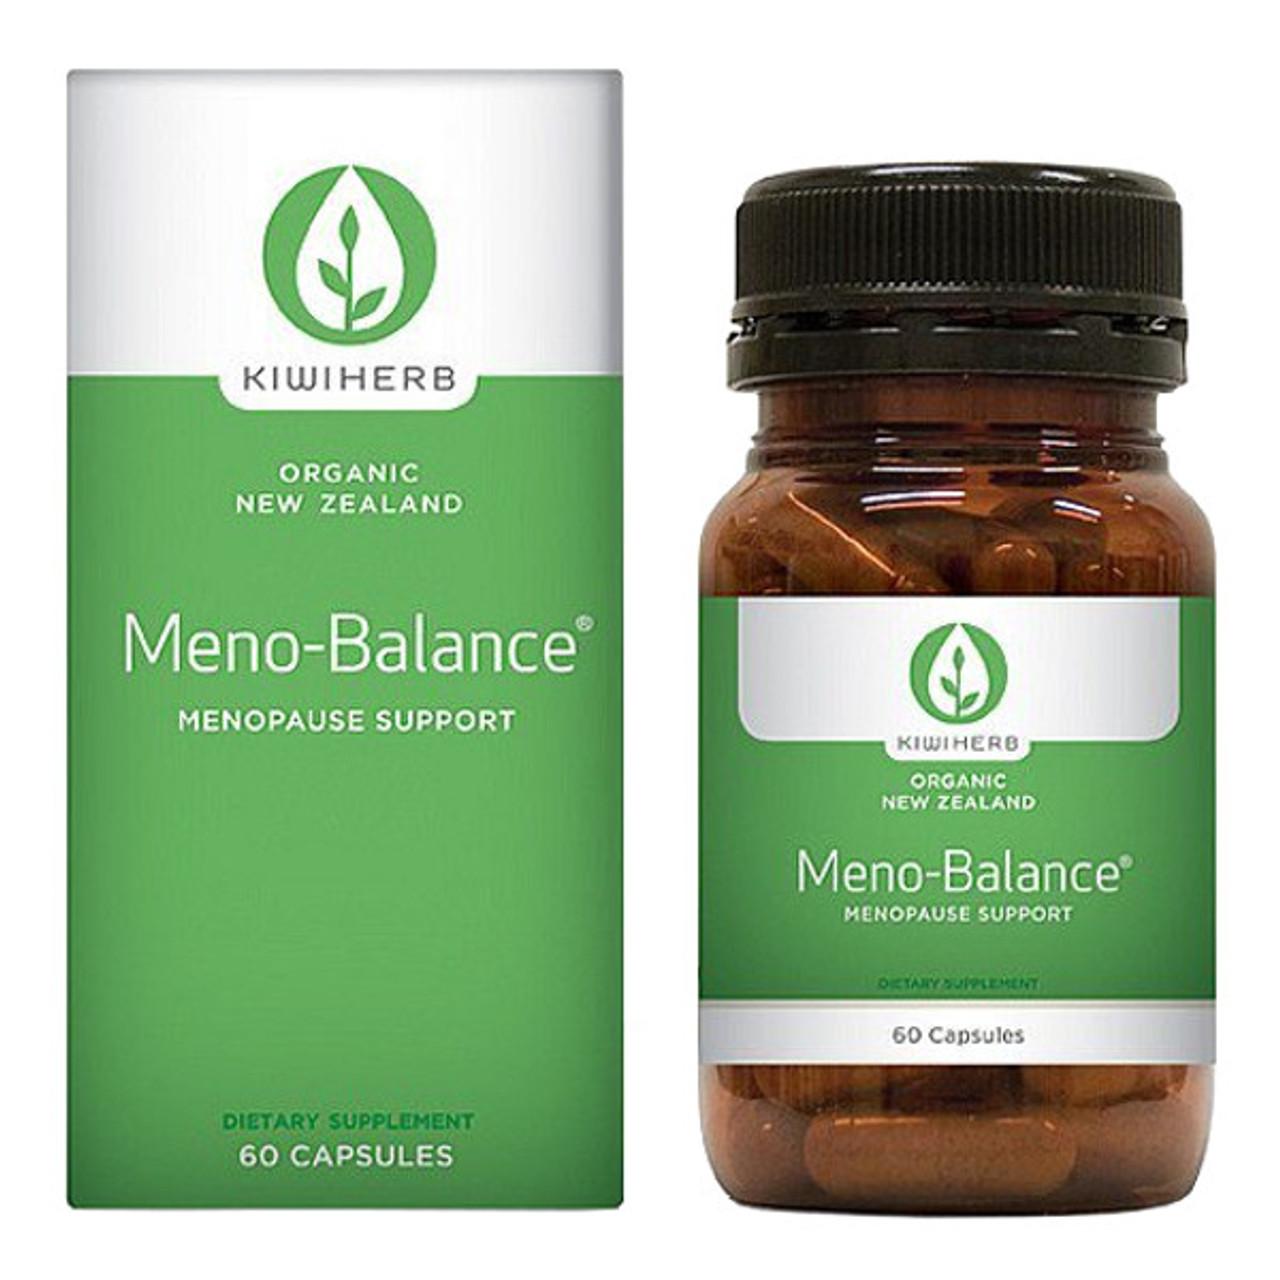 KiwiHerb Meno Balance